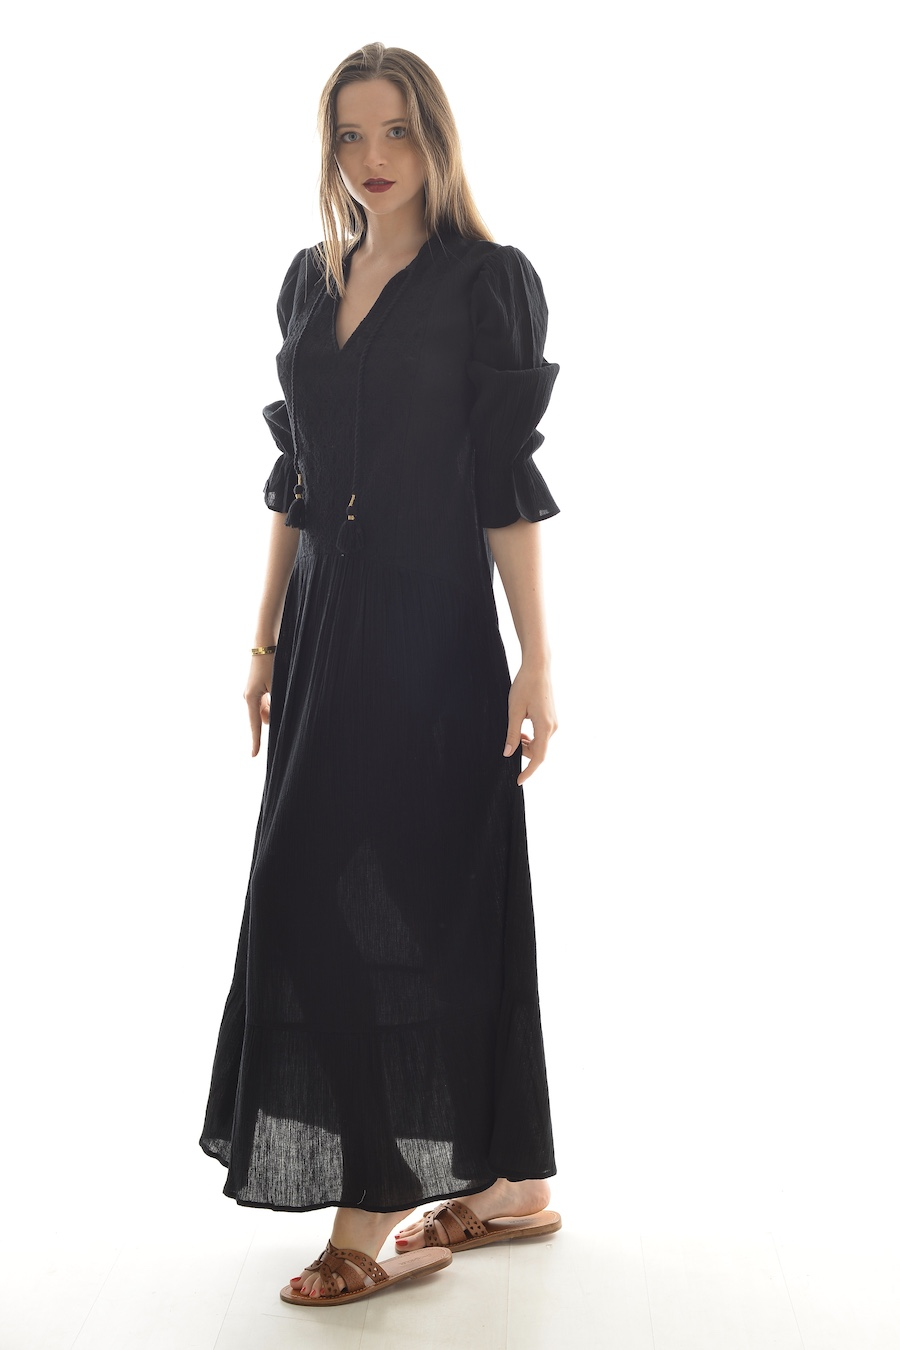 Robin, prêt à porter - ROBE ADÈLE BLACK